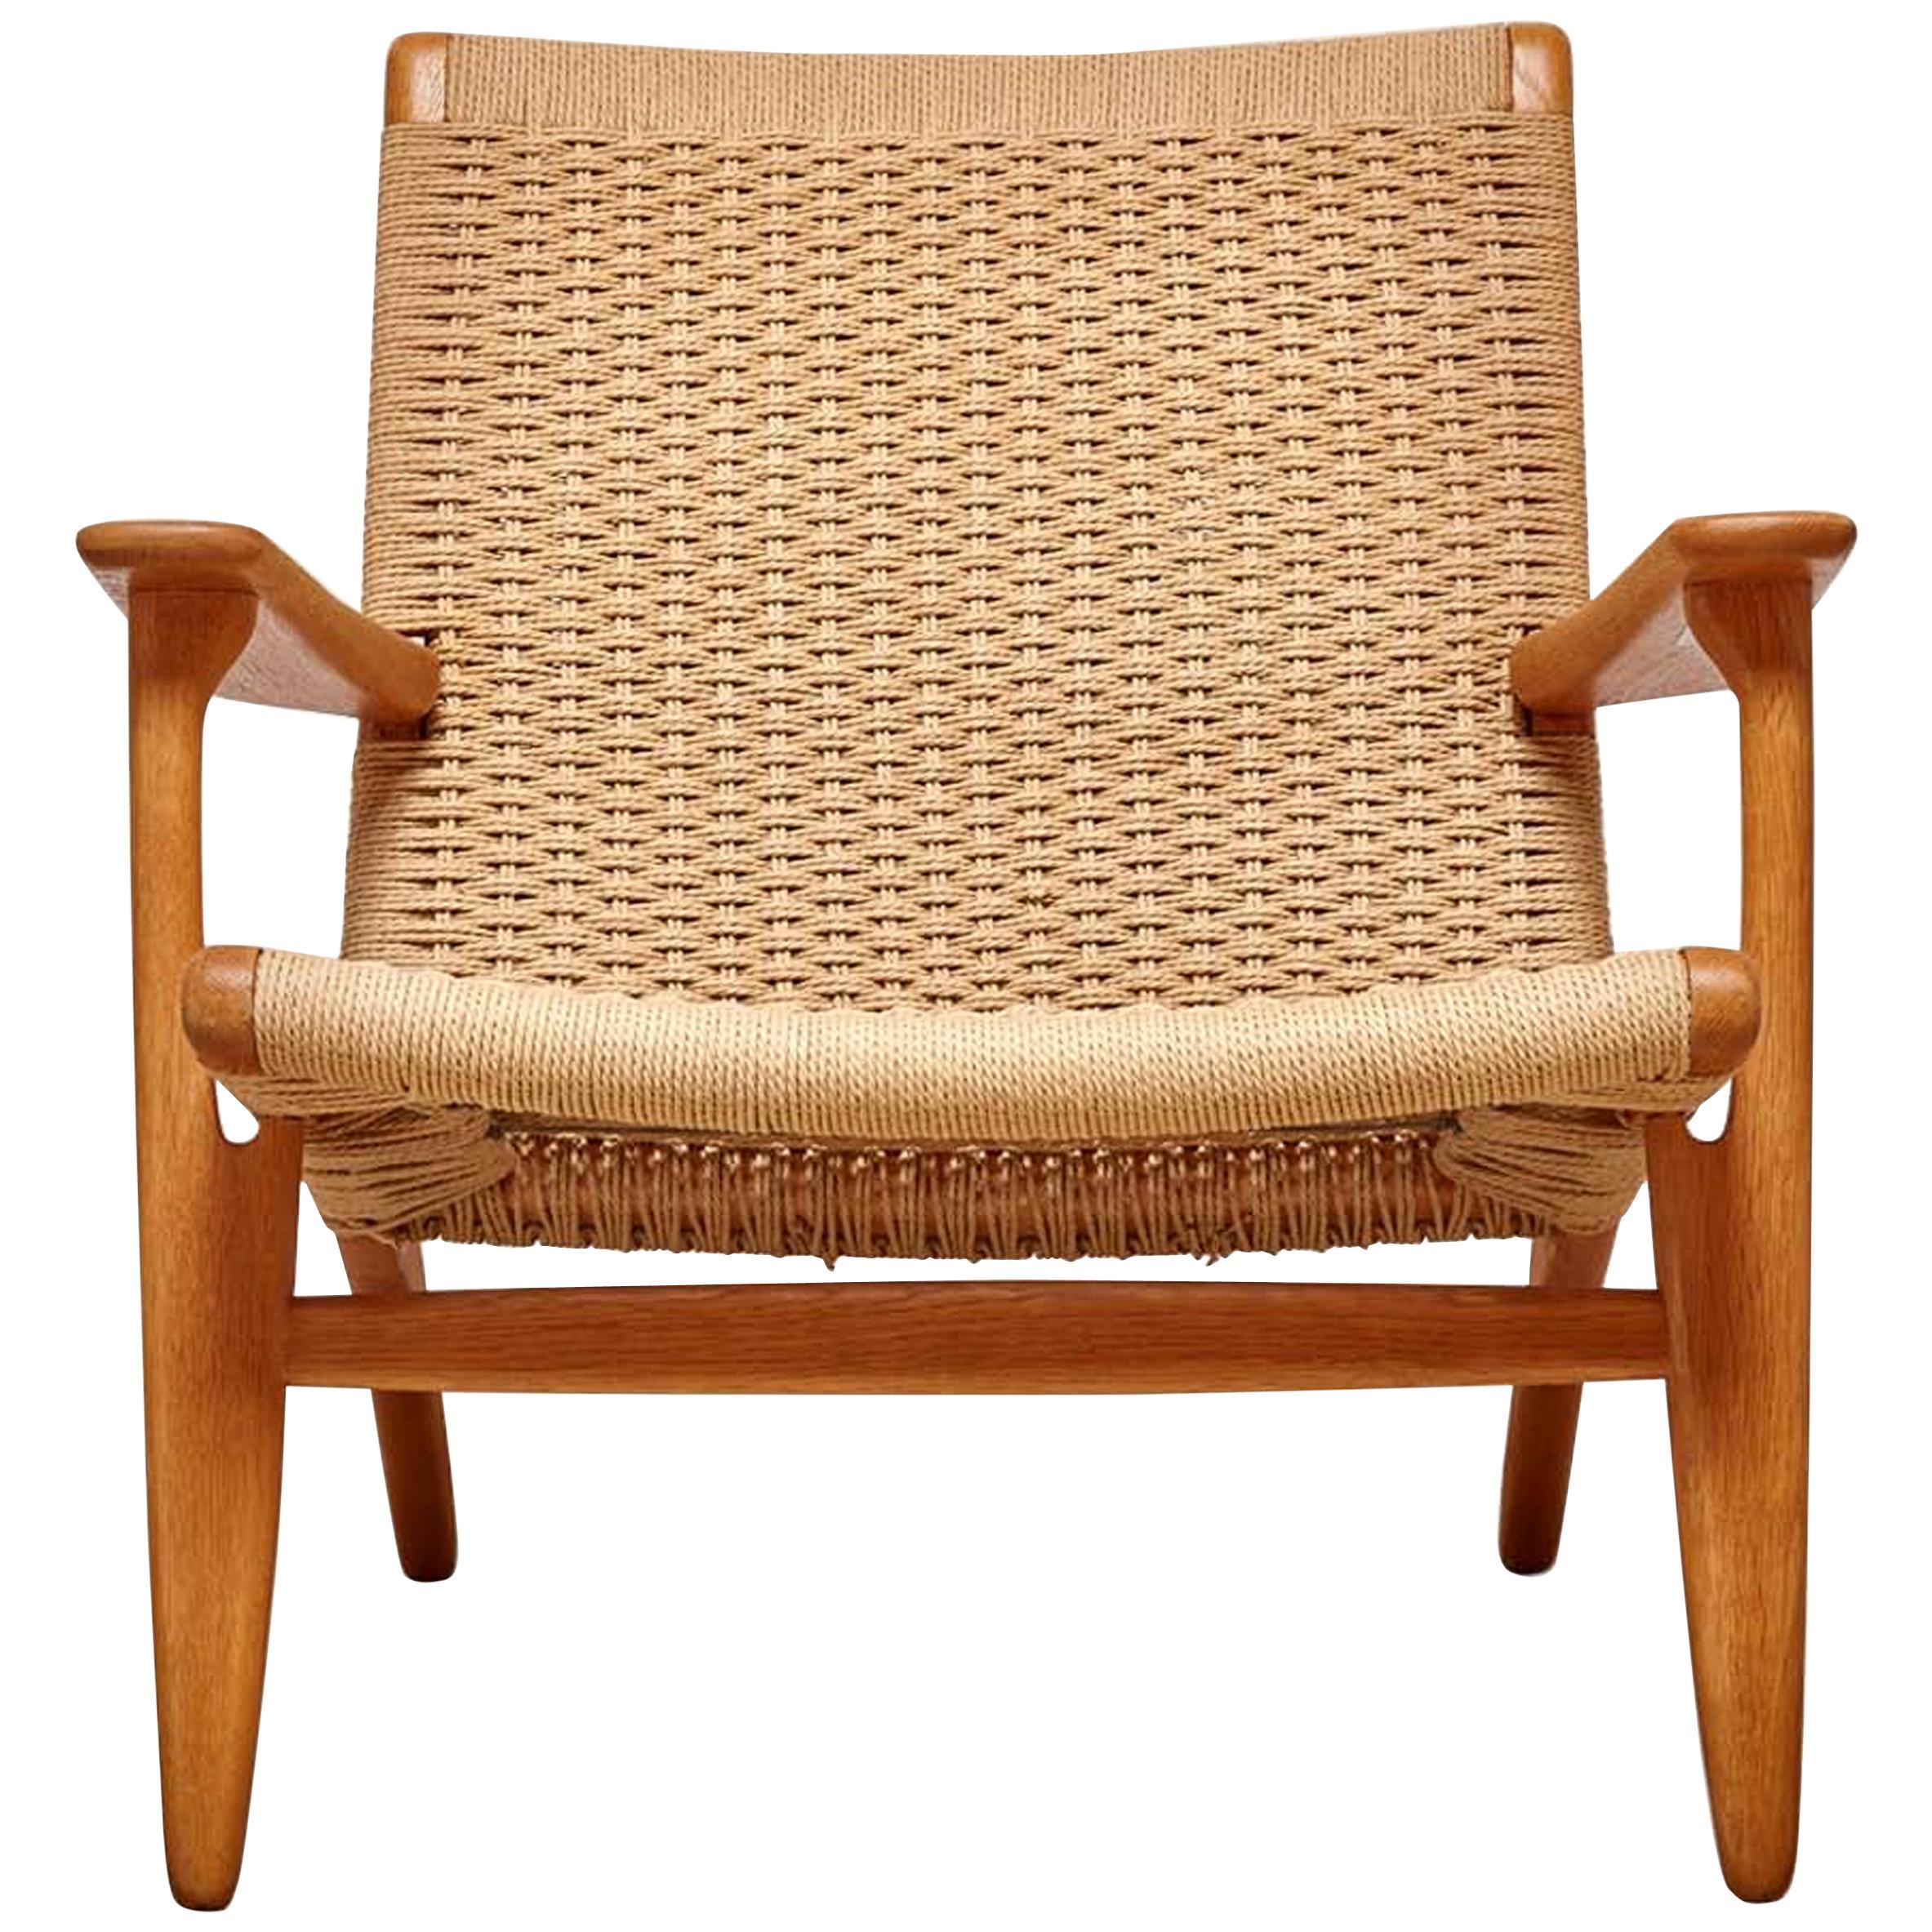 Woven CH25 Chair by Hans Wegner for Carl Hansen & Son